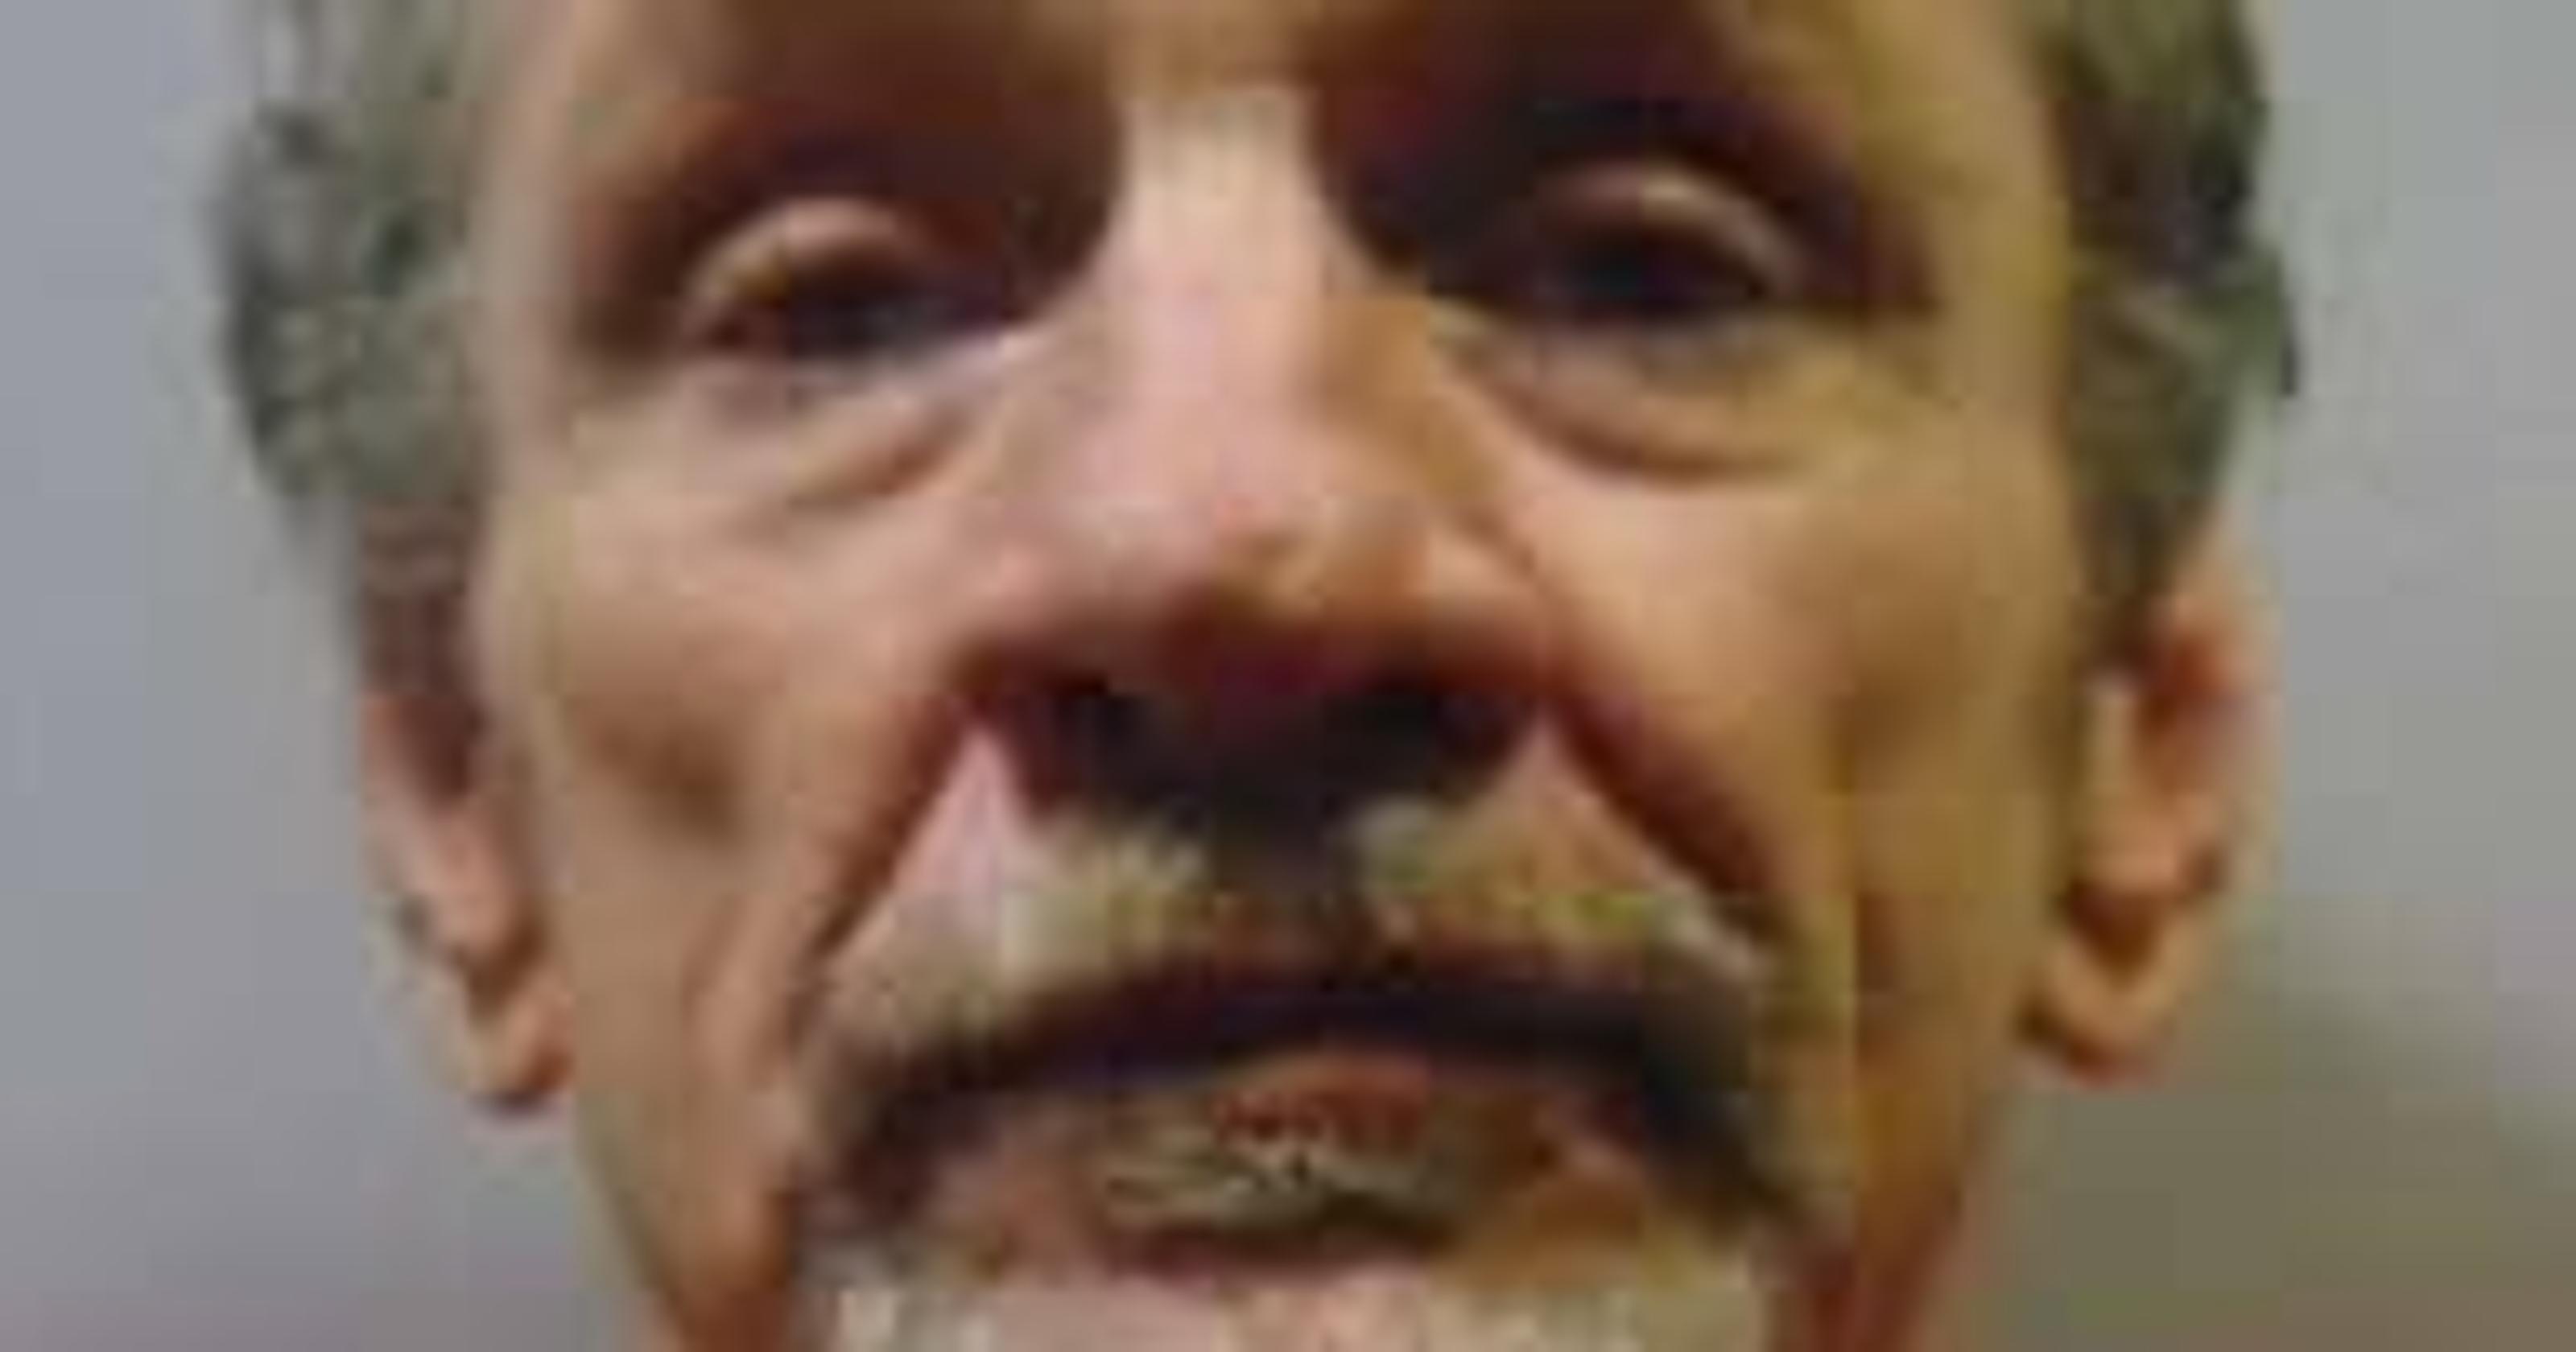 Third S  Illinois inmate escapee captured Saturday night